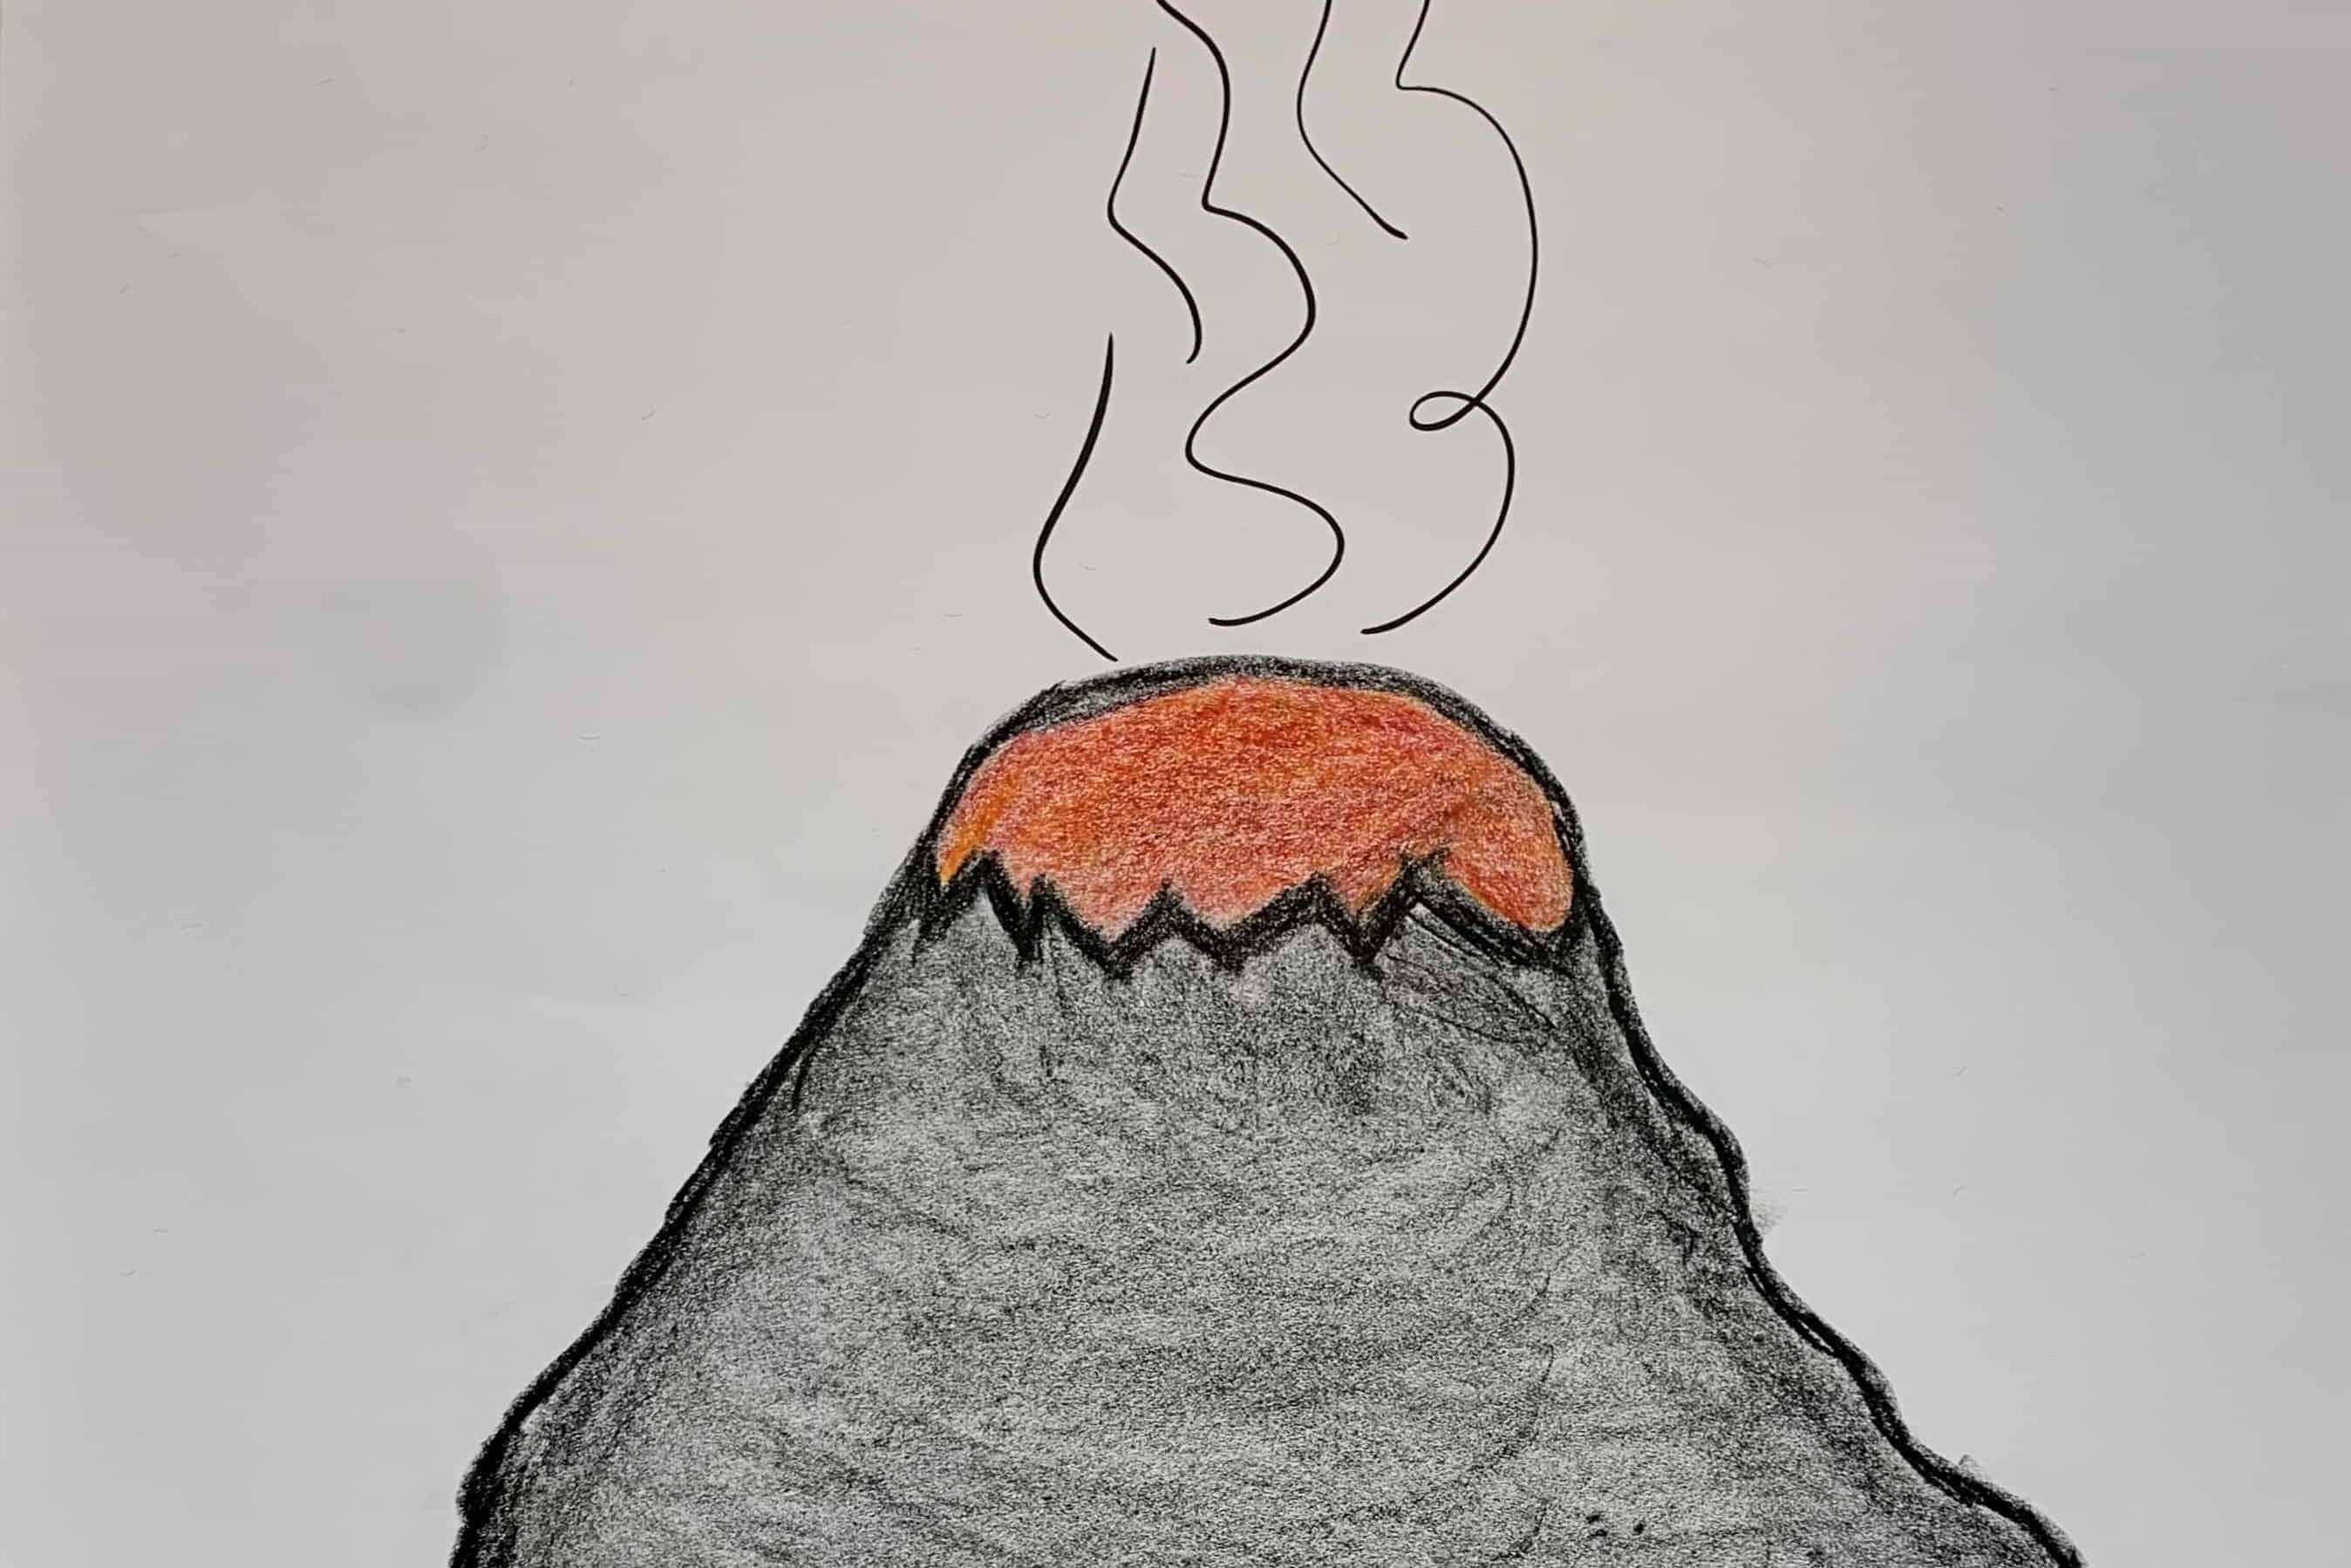 Energie aus Konflikten Vulkan